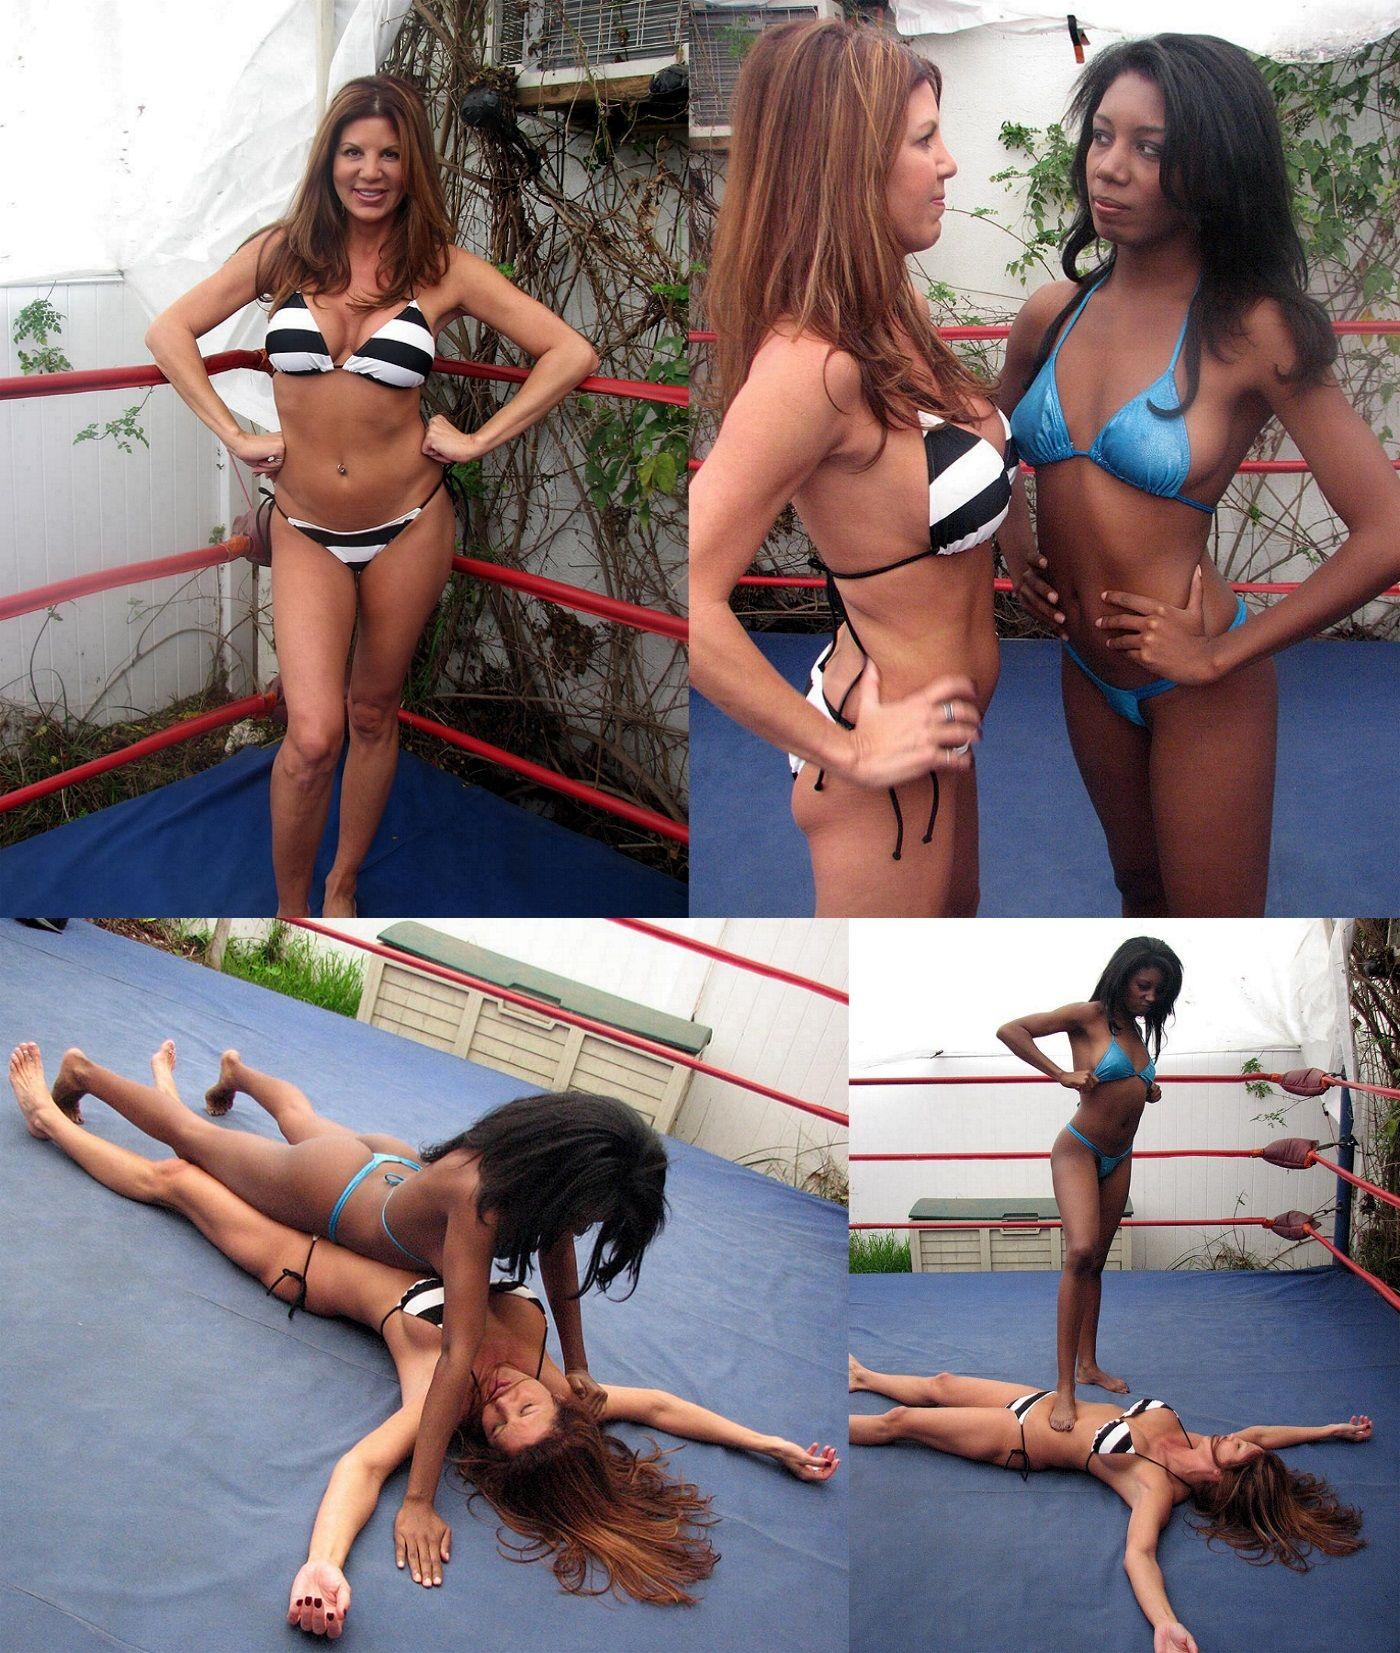 Bikini wrestling clips